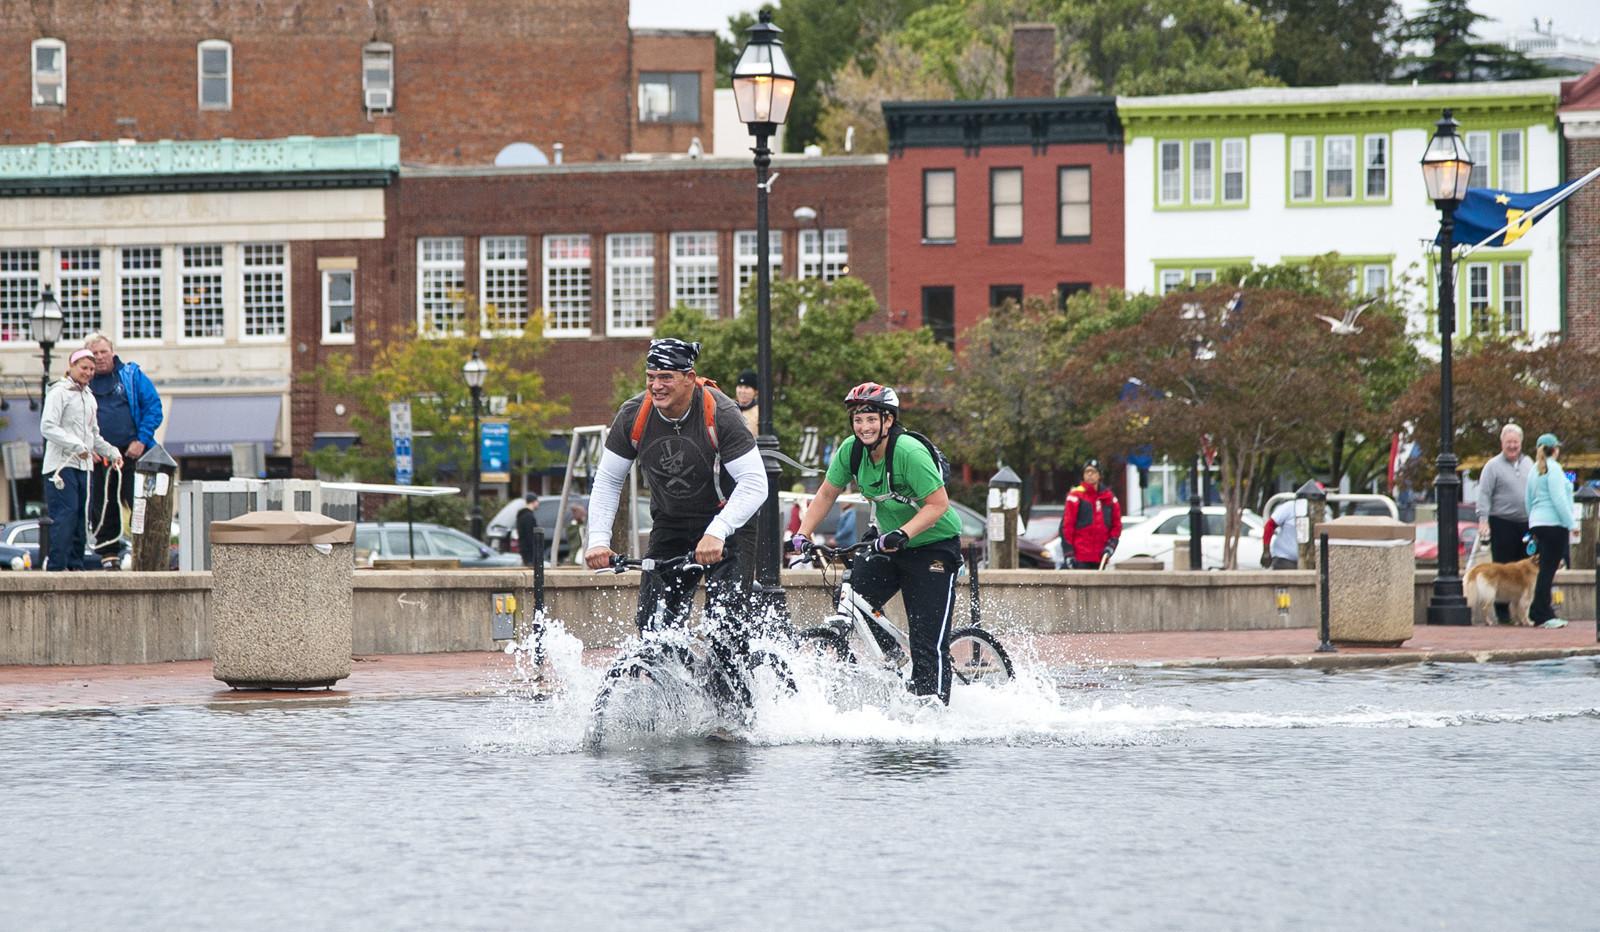 Coastal flooding, sunny skies in forecast - Capital Gazette